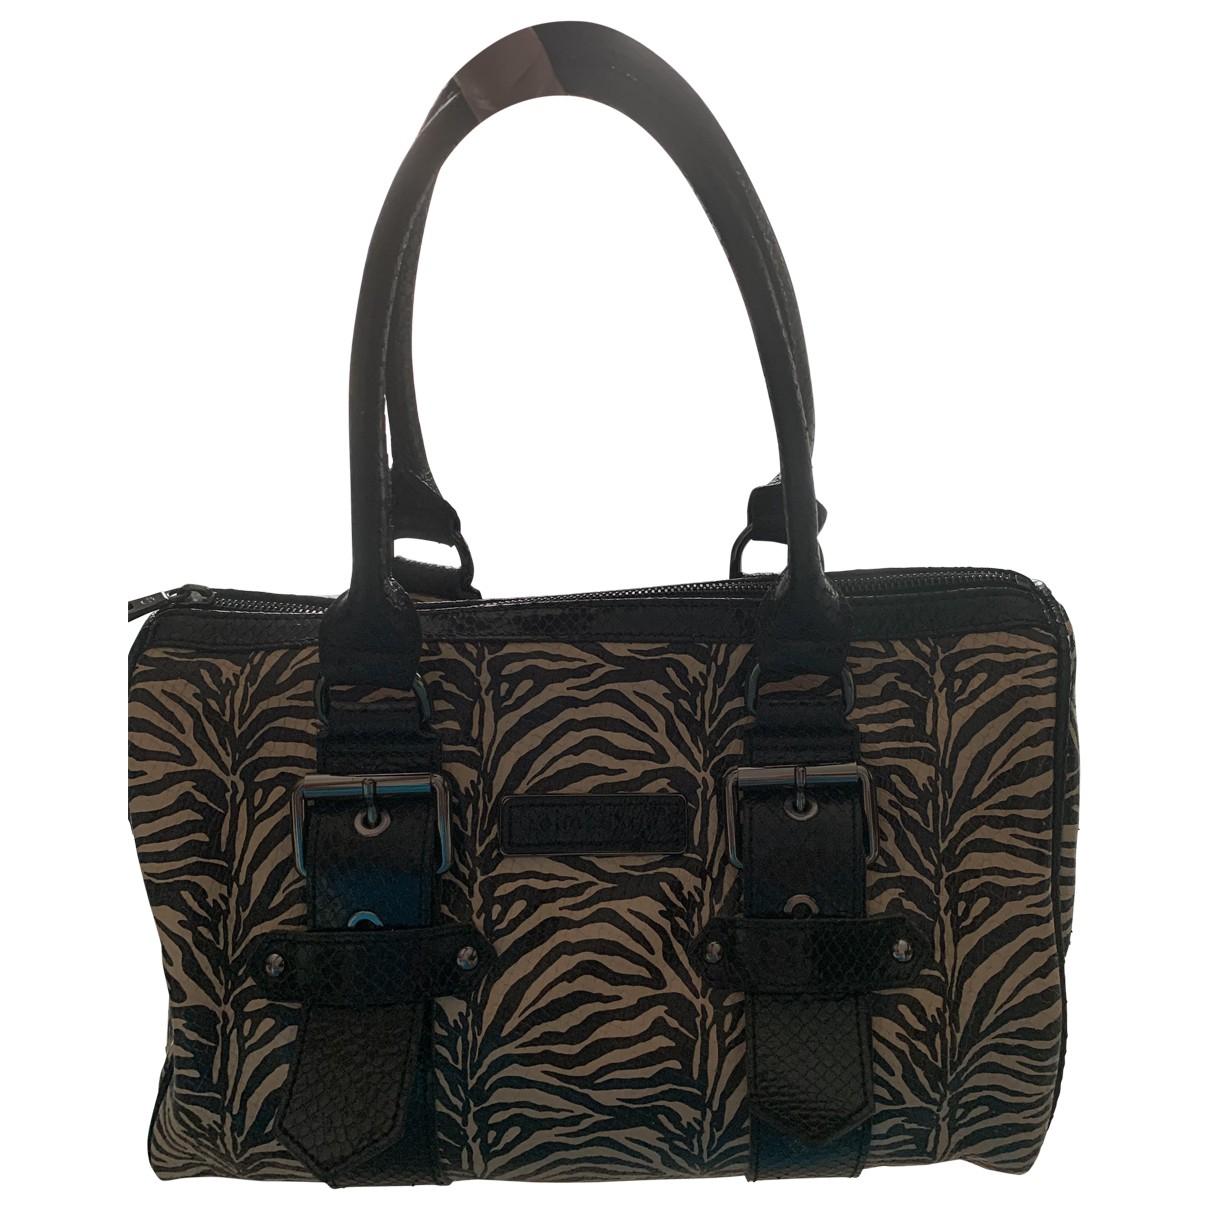 Longchamp Kate Moss Handtasche in  Schwarz Echse